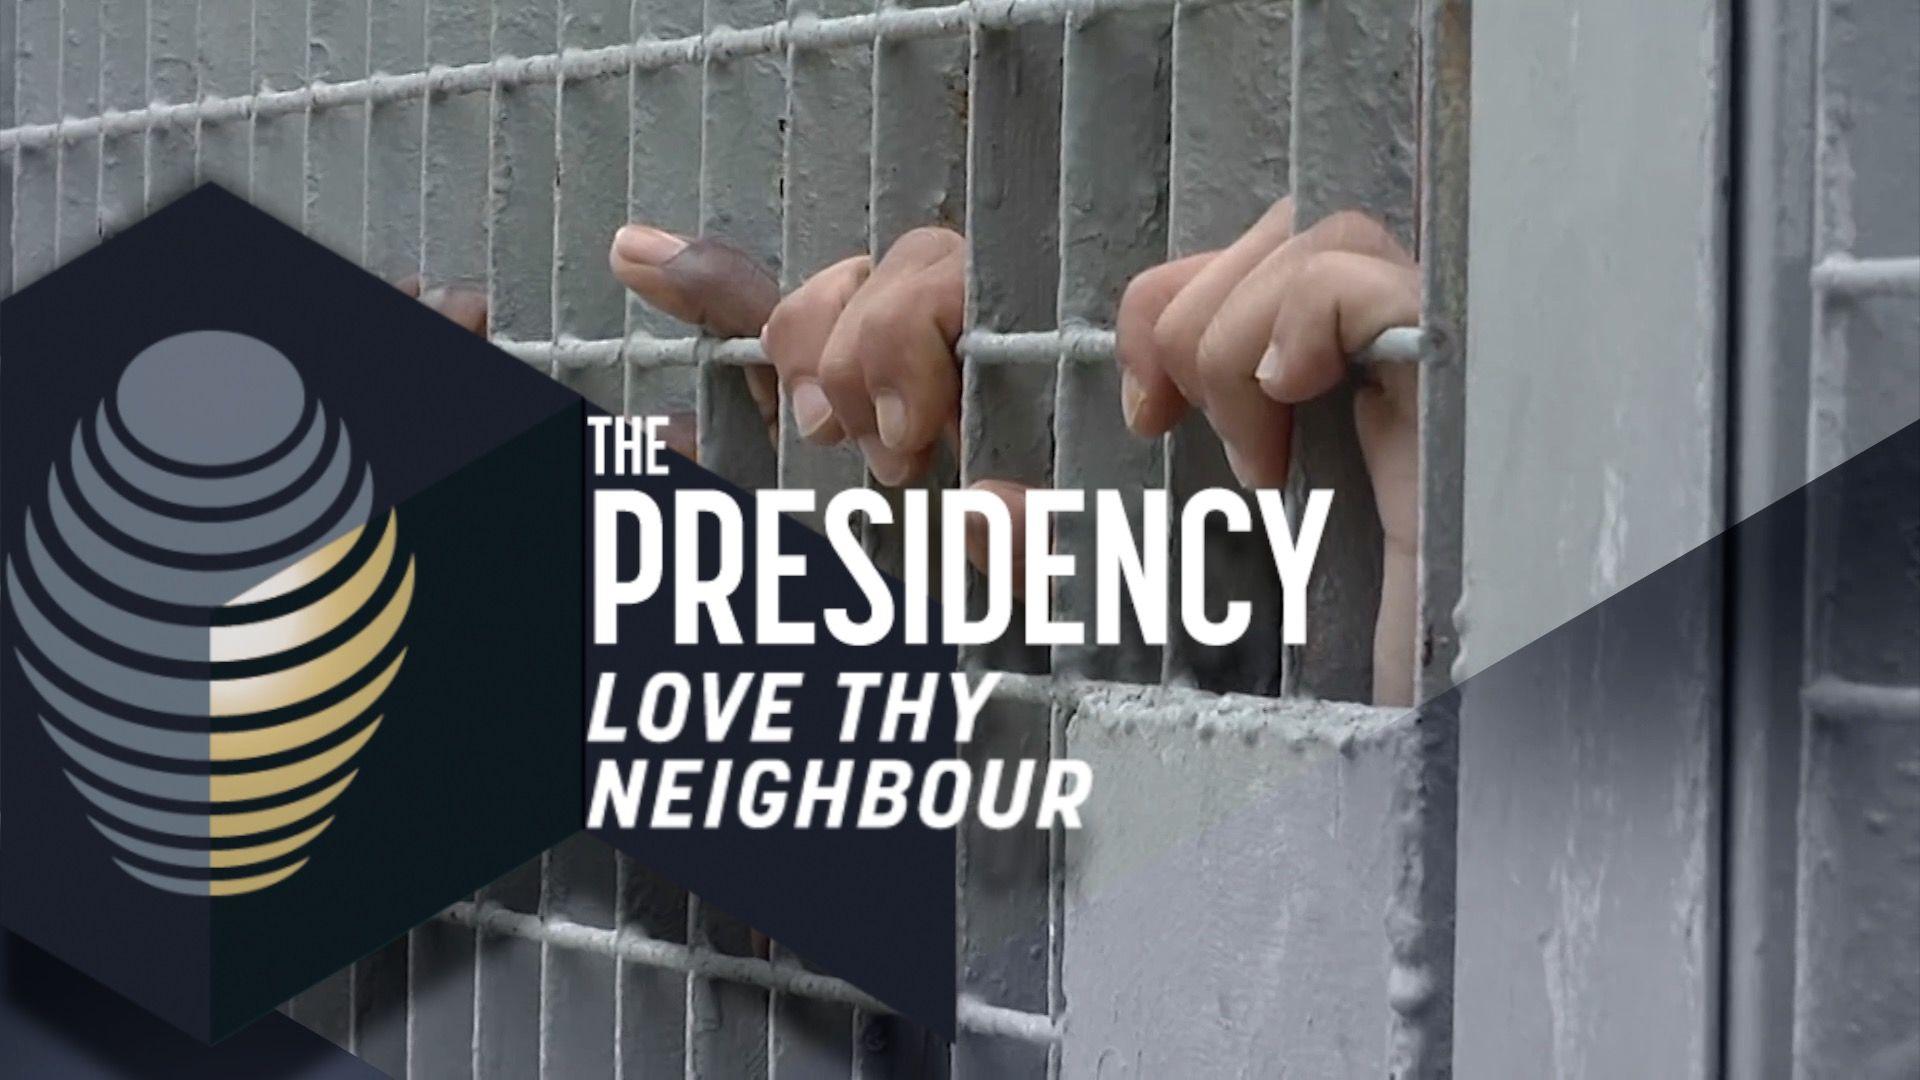 european neighborhood policy European neighbourhood policy – southern dimension the southern dimension is the second pillar of the european neighborhood policy (enp) and focuses on eu relations with 10 mediterranean partners (egypt, algeria, jordan, israel, lebanon, libya, morocco, syria, tunisia and the palestinian authority.